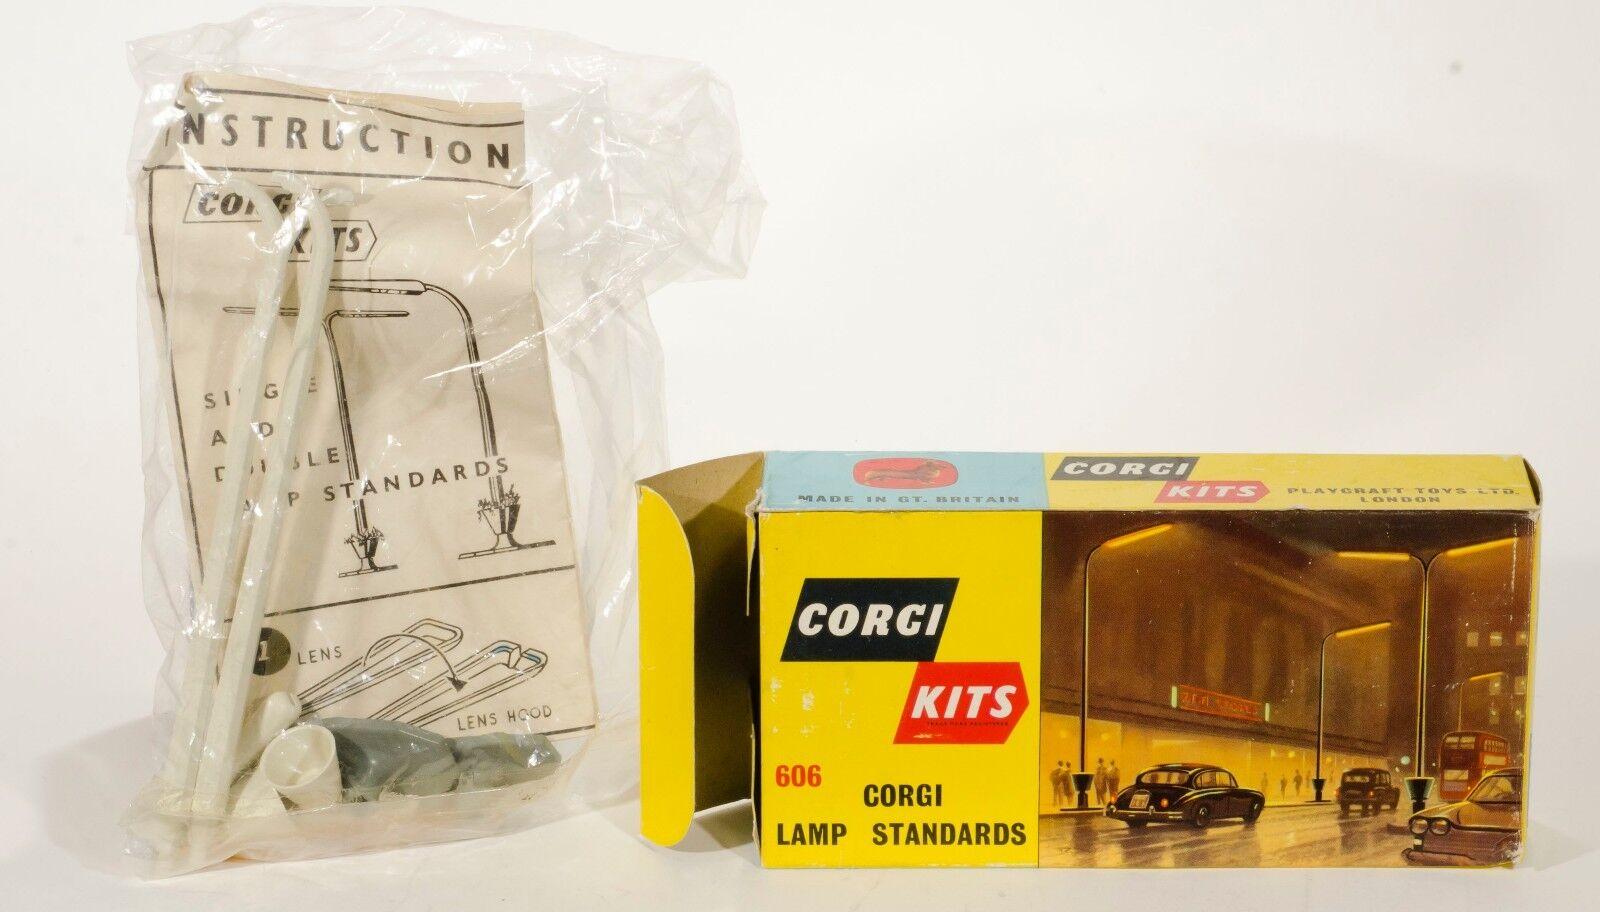 Corgi Kits 606 'Corgi Lamp Standards'. Unmade. Boxed. Original 1960's